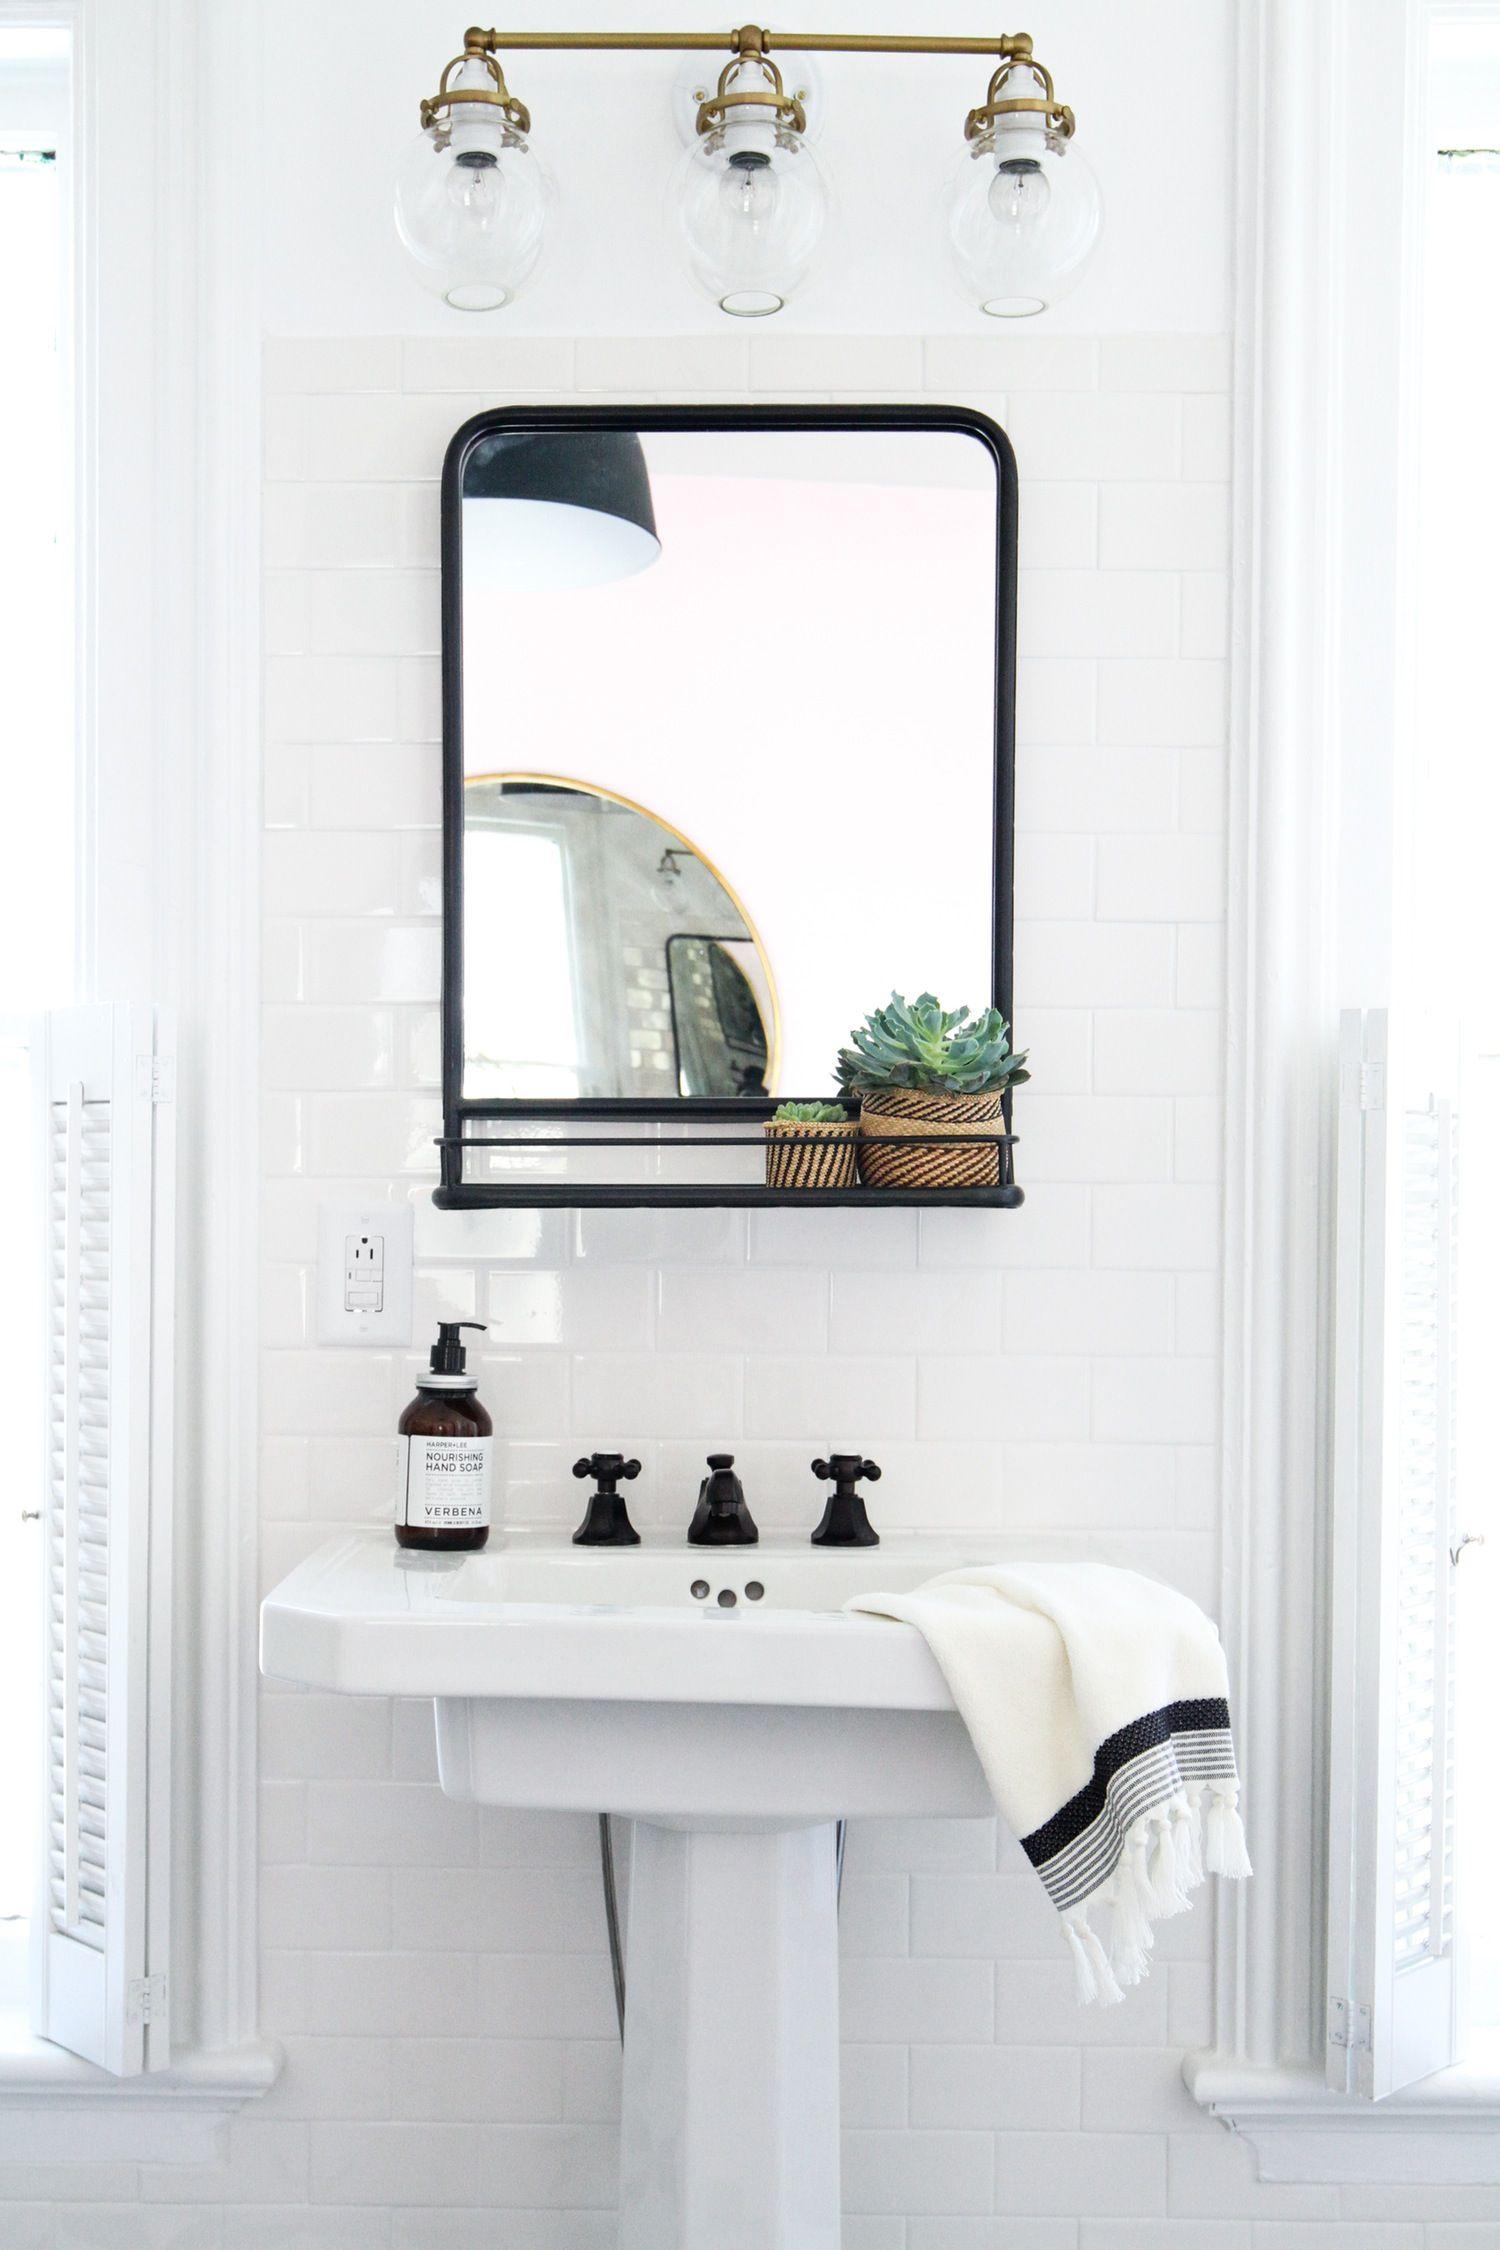 How to Hang a Bathroom Mirror on Ceramic Tile | Ashley s, Bathroom ...